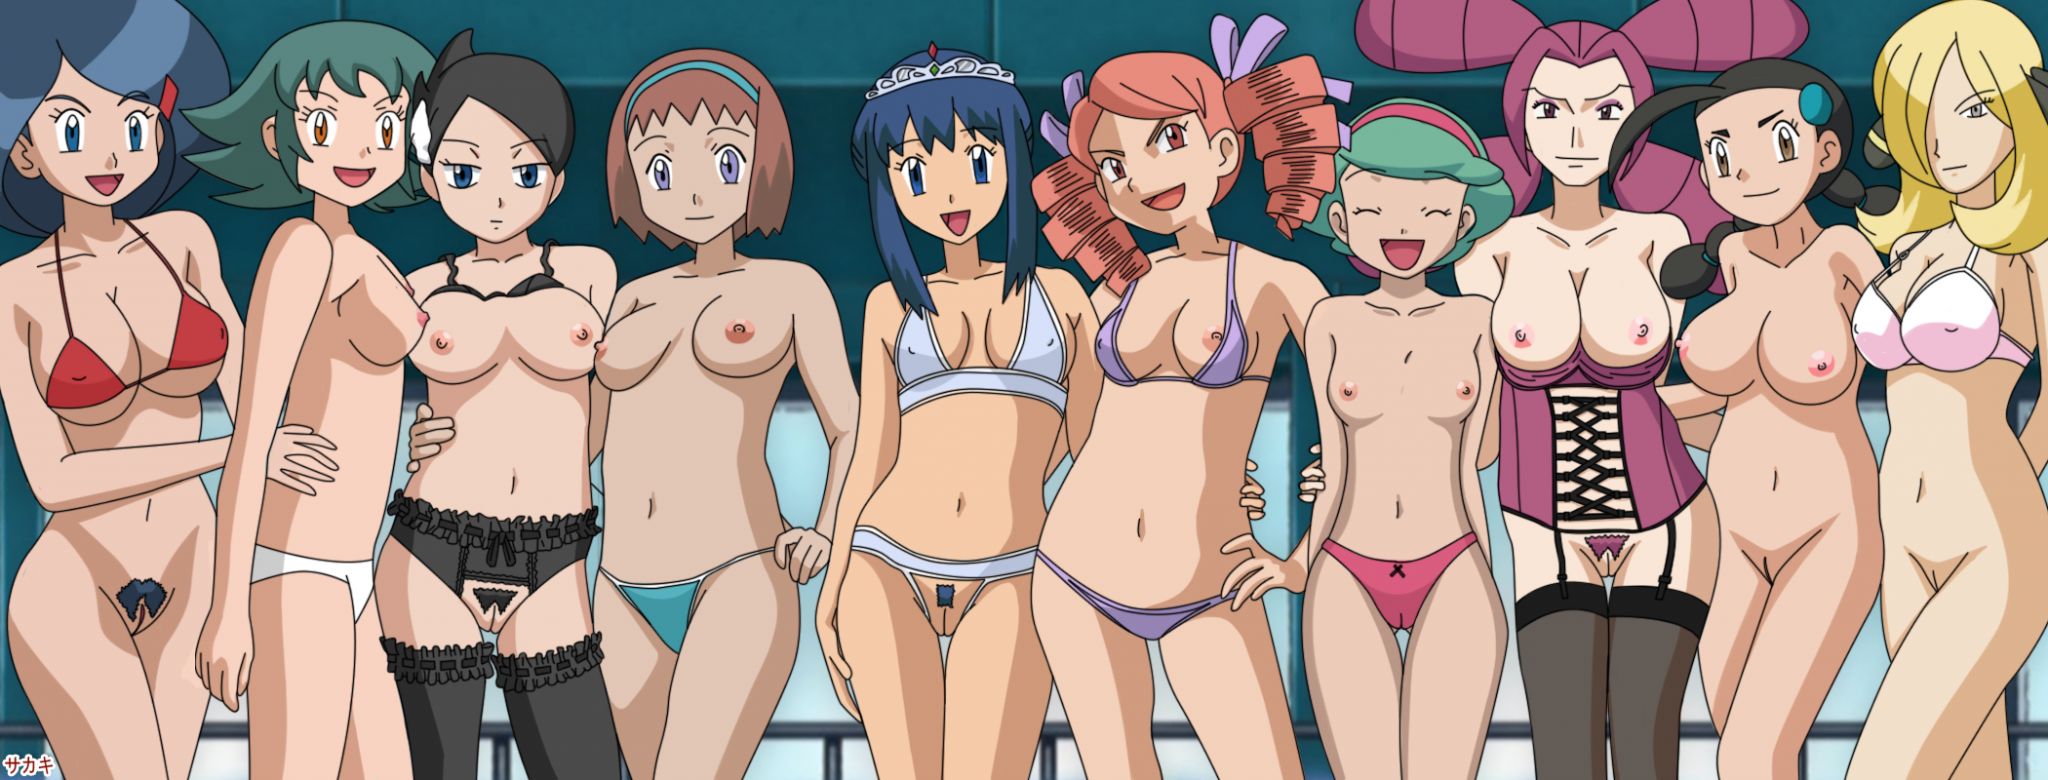 Sexy women naked hotties